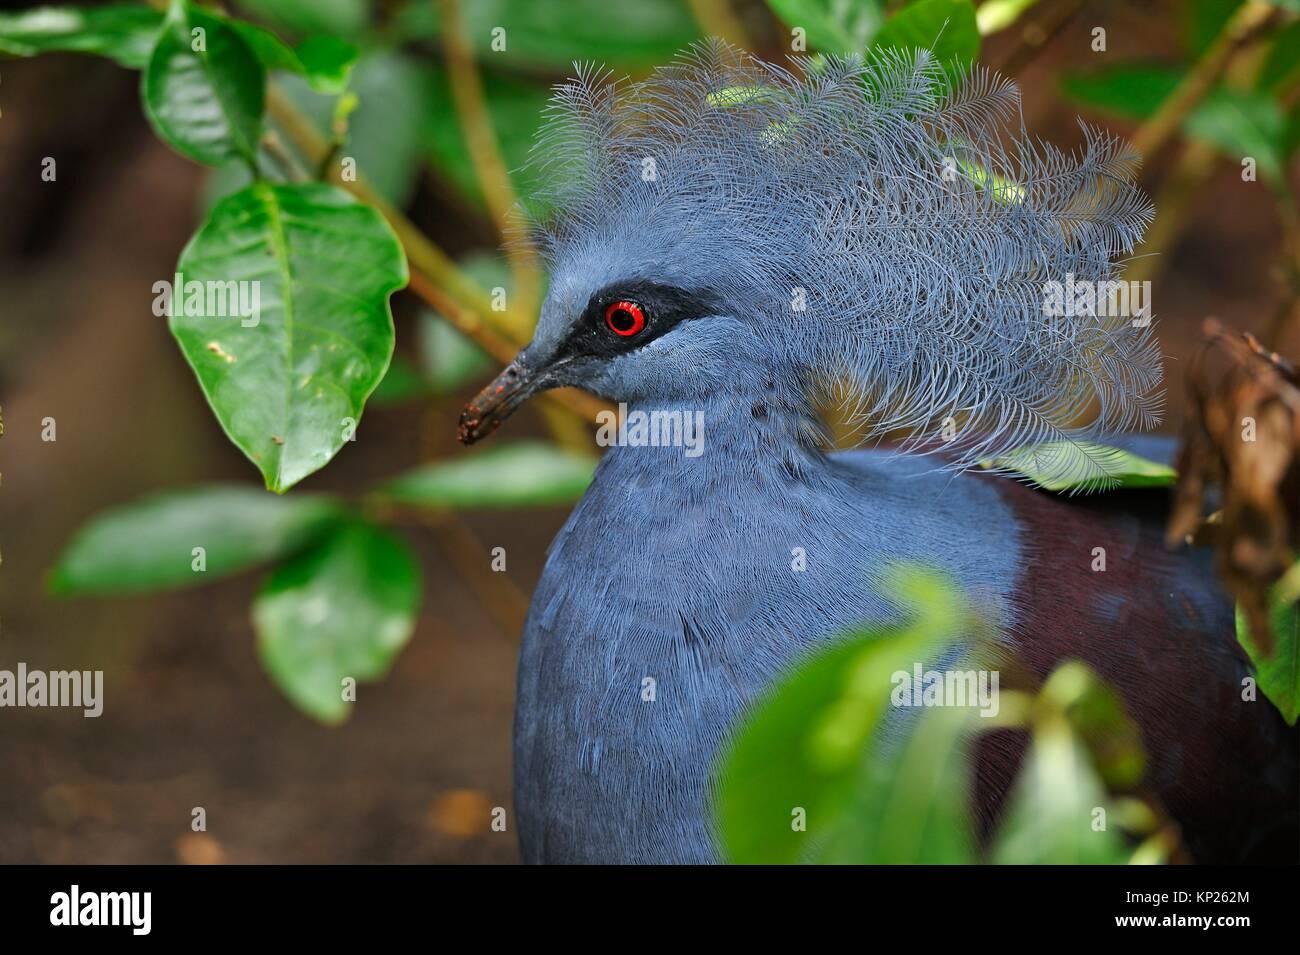 Victoria crowned pigeon (Goura victoria), Rainforest Pyramid, Moody Gardens, Galveston island, Gulf of Mexico, Texas, - Stock Image